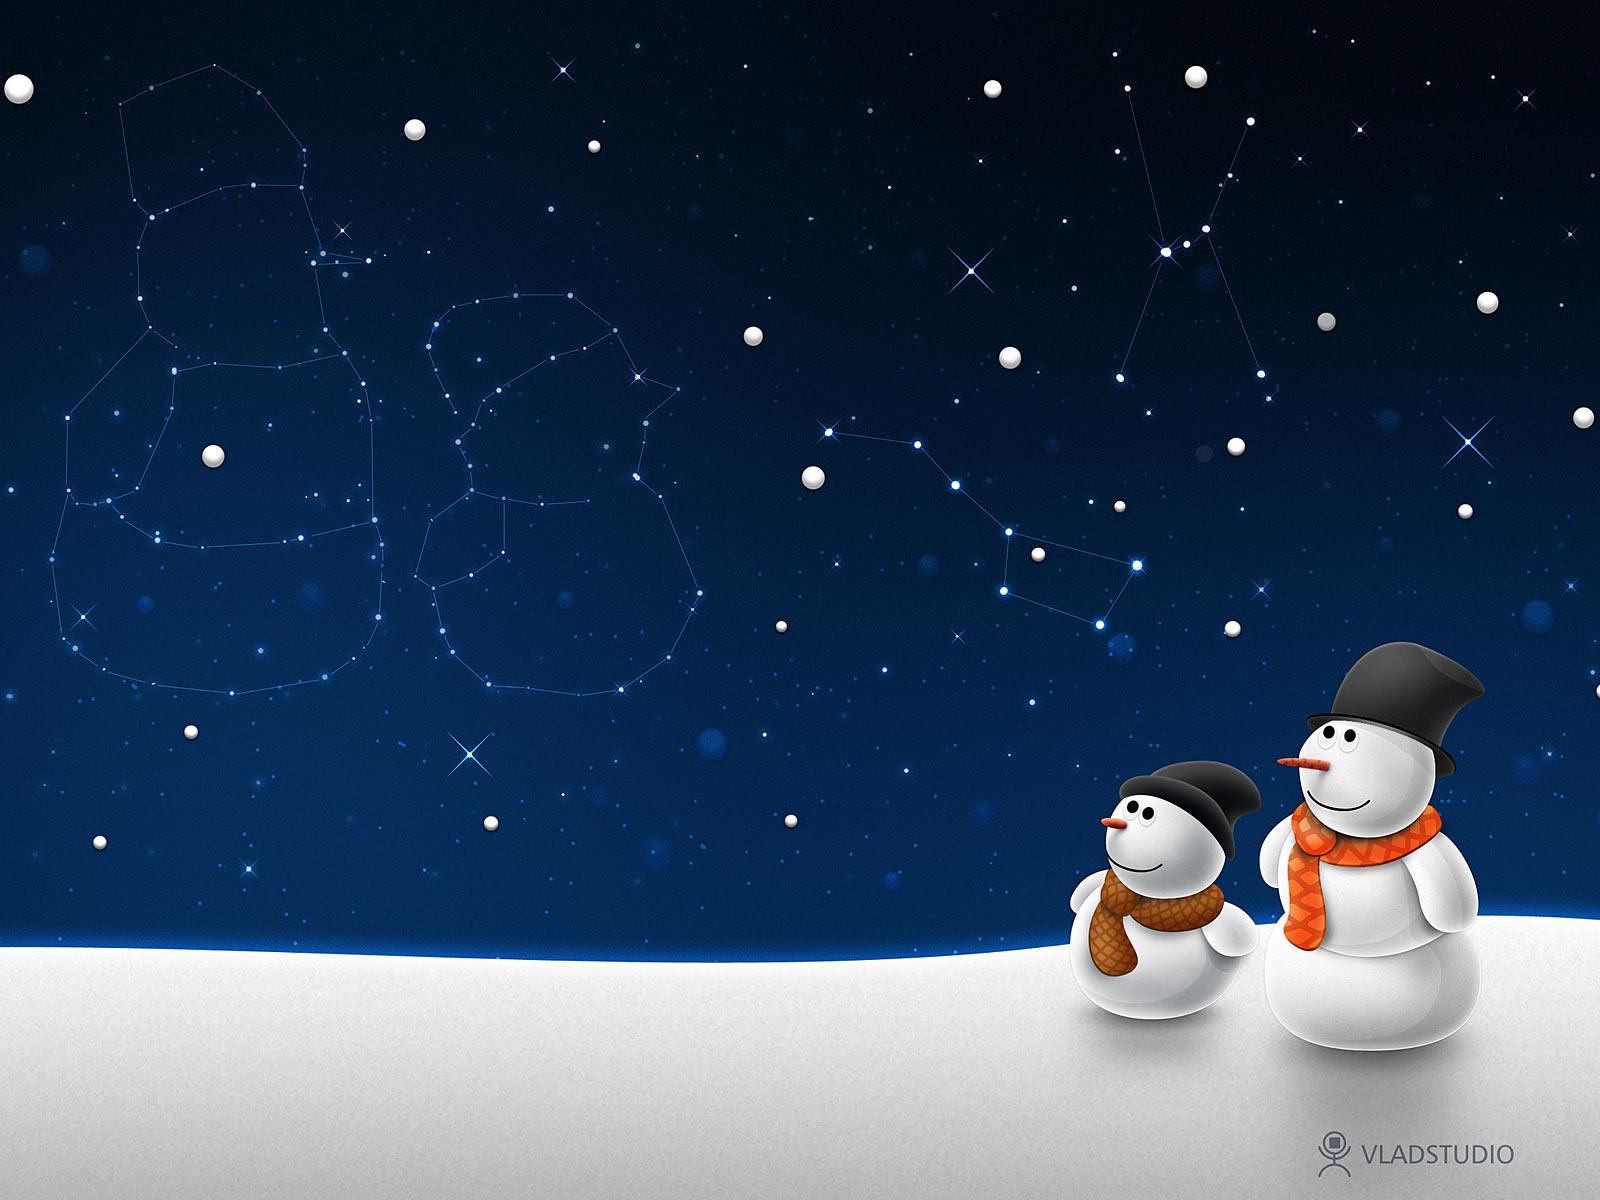 christmas wallpaper,snowman,cartoon,sky,winter,snow